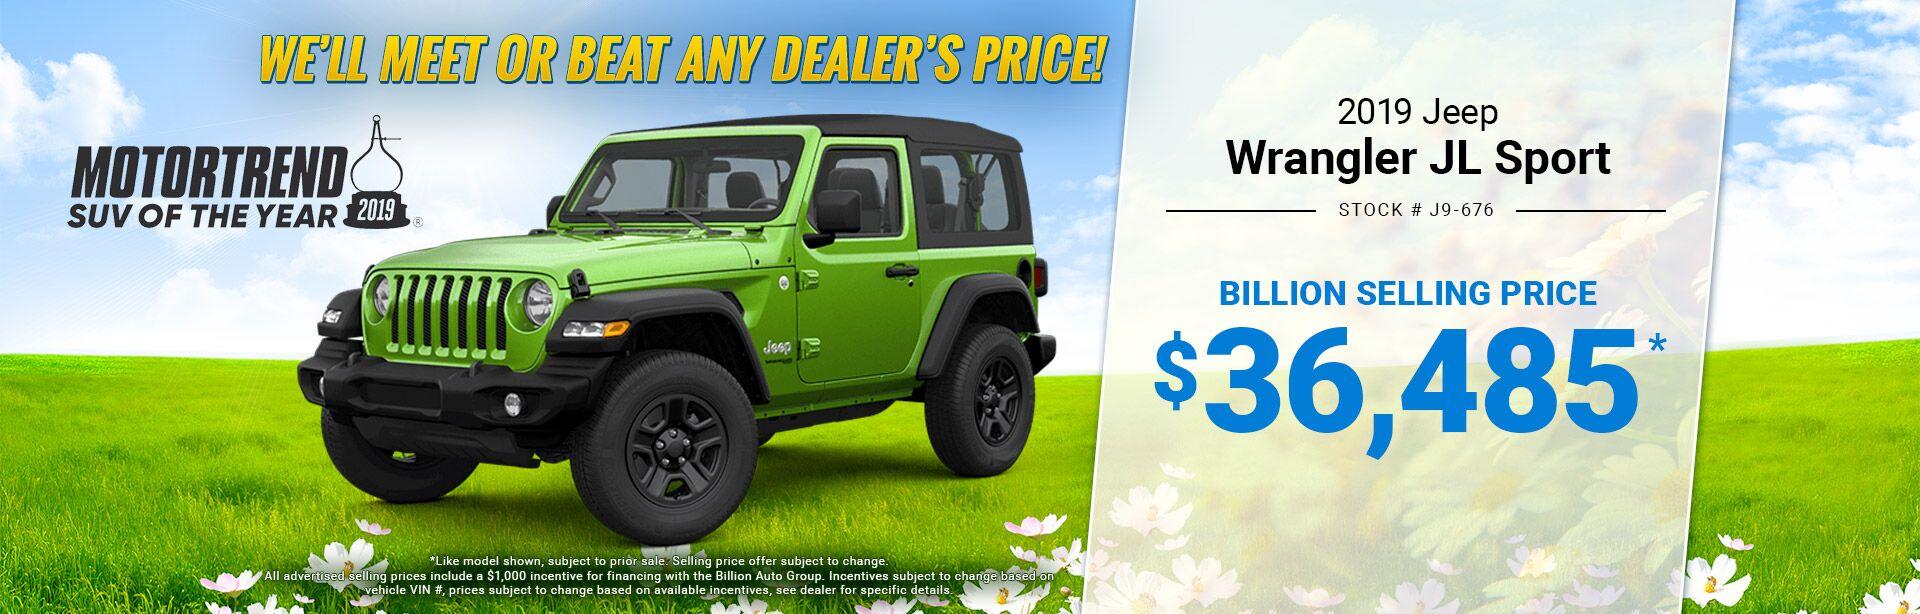 Bozeman Car Dealerships >> Buick Chrysler Dodge Gmc Jeep Nissan Ram Dealership Bozeman Mt